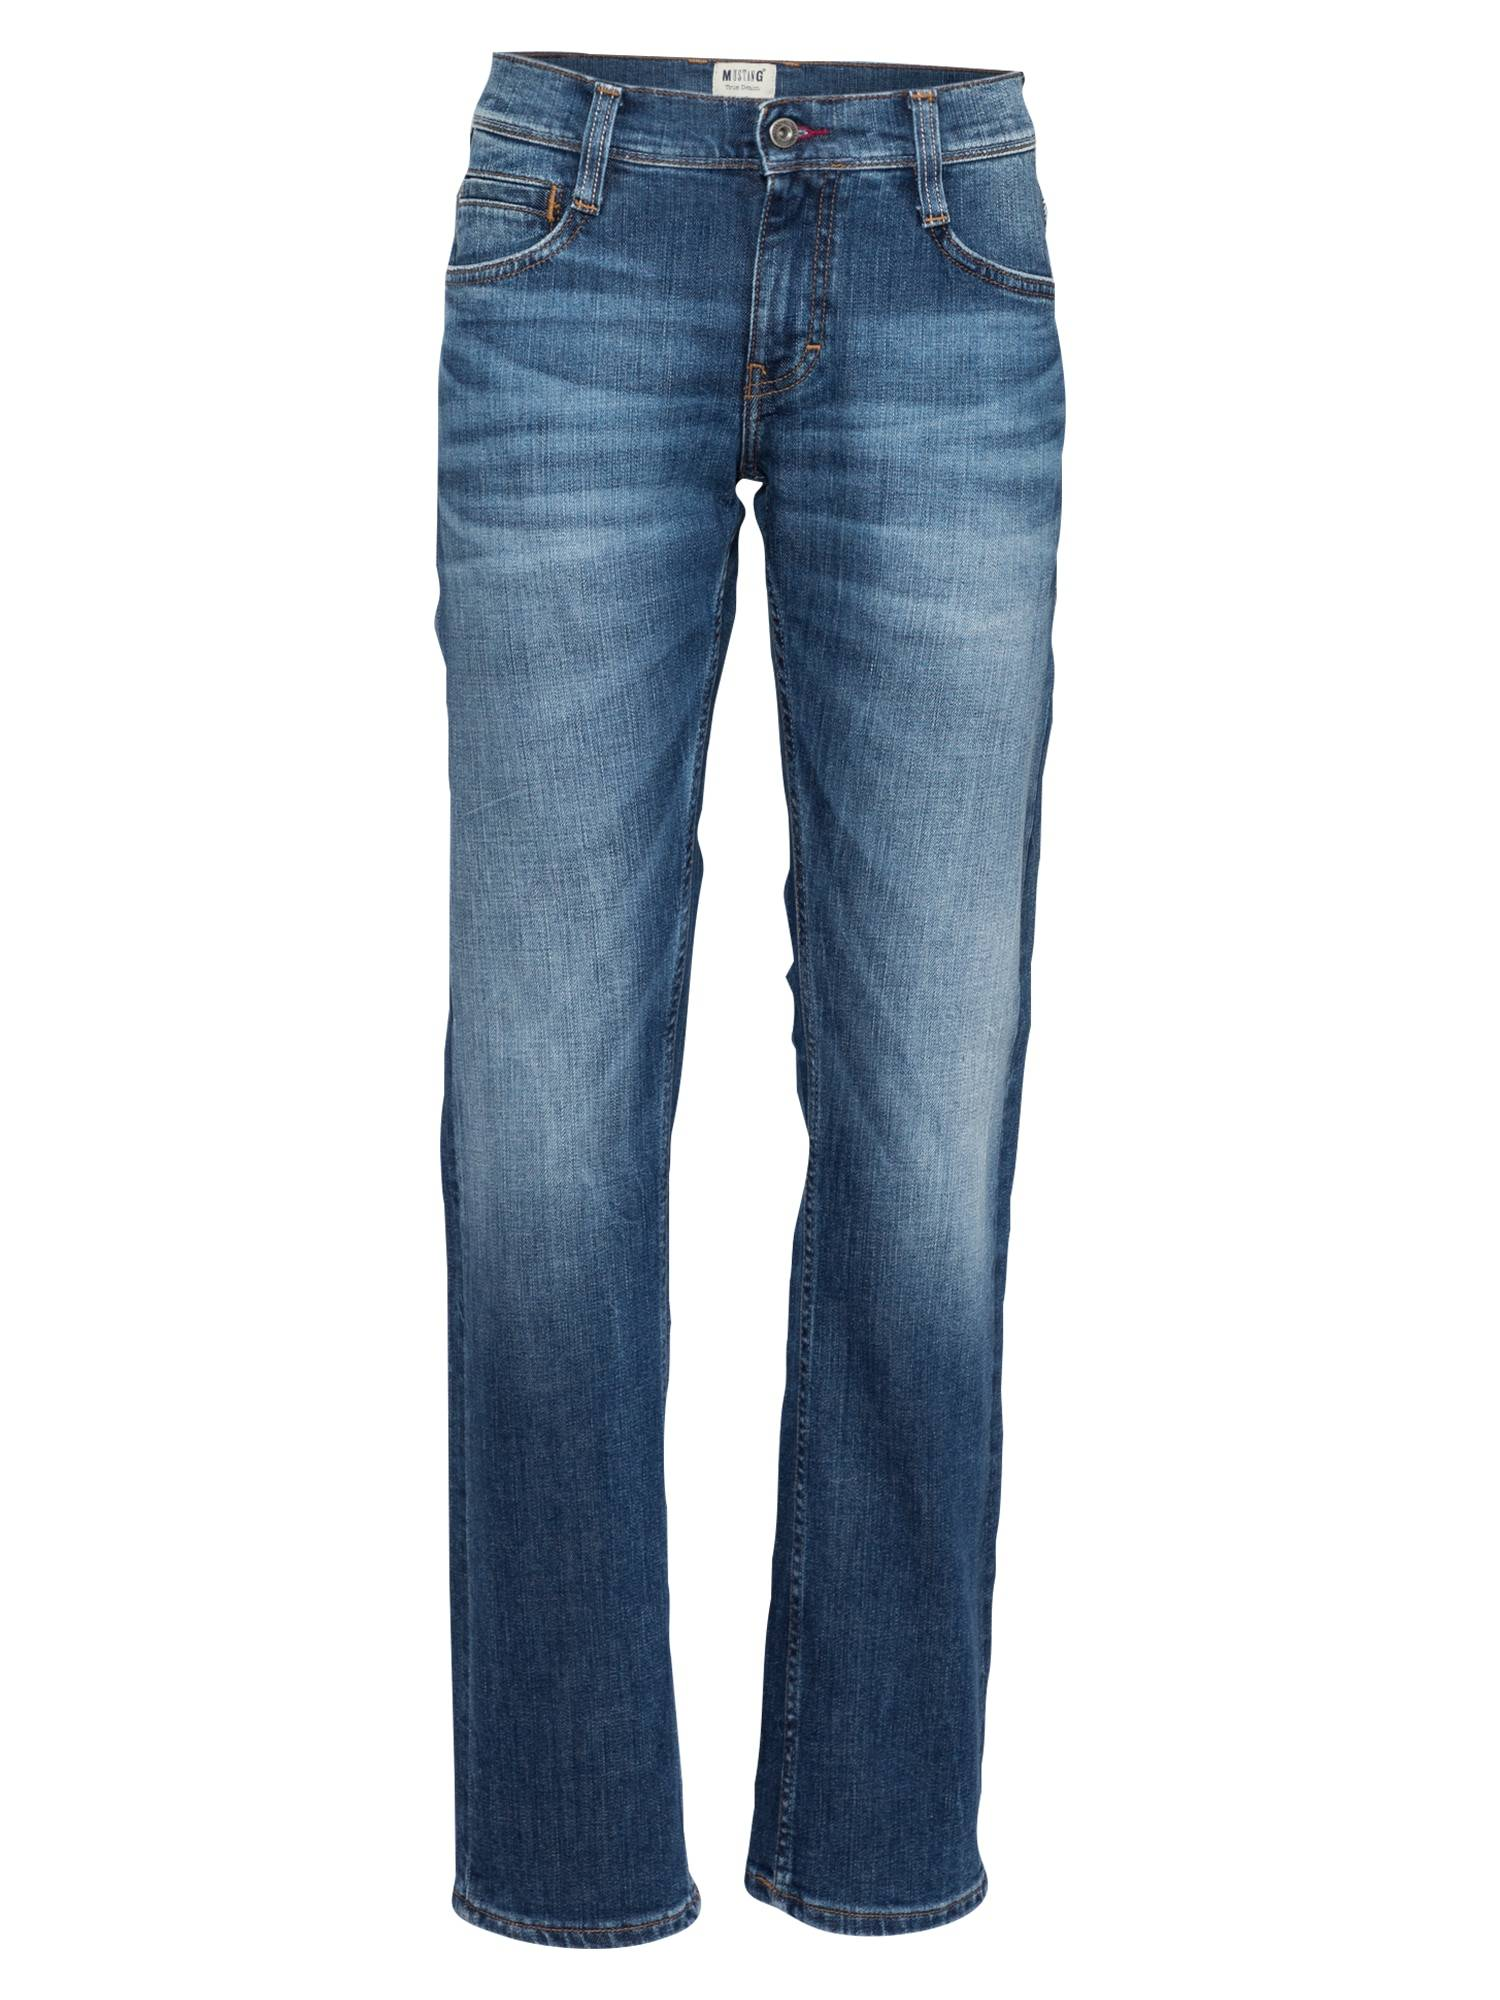 MUSTANG Jean 'Oregon '  - Bleu - Taille: 31/34 - male